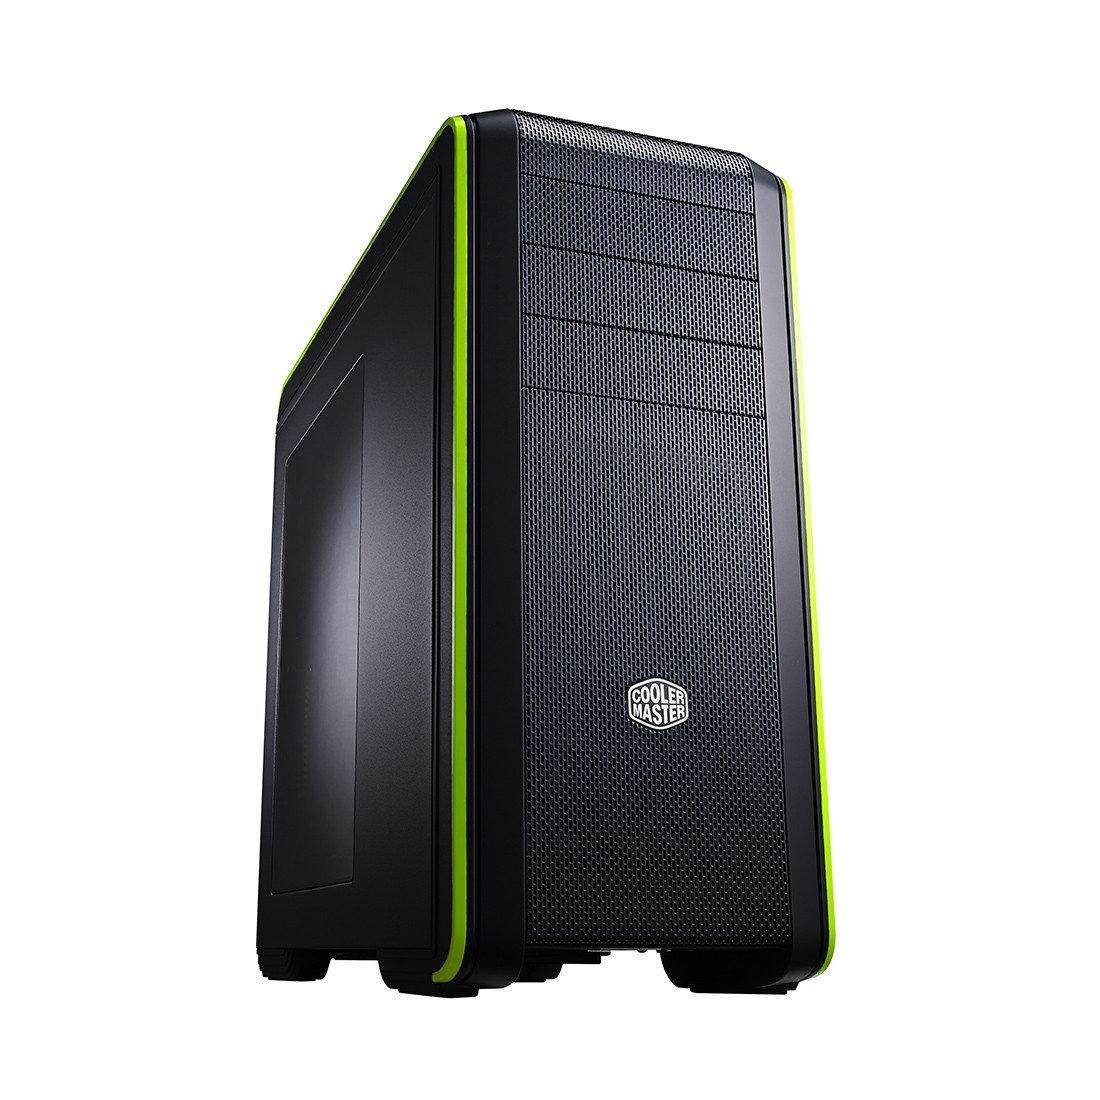 Системный блок Intel Core i3-8100 3.6GHZ/H310/DDR4 8GB/HDD 1TB/450W